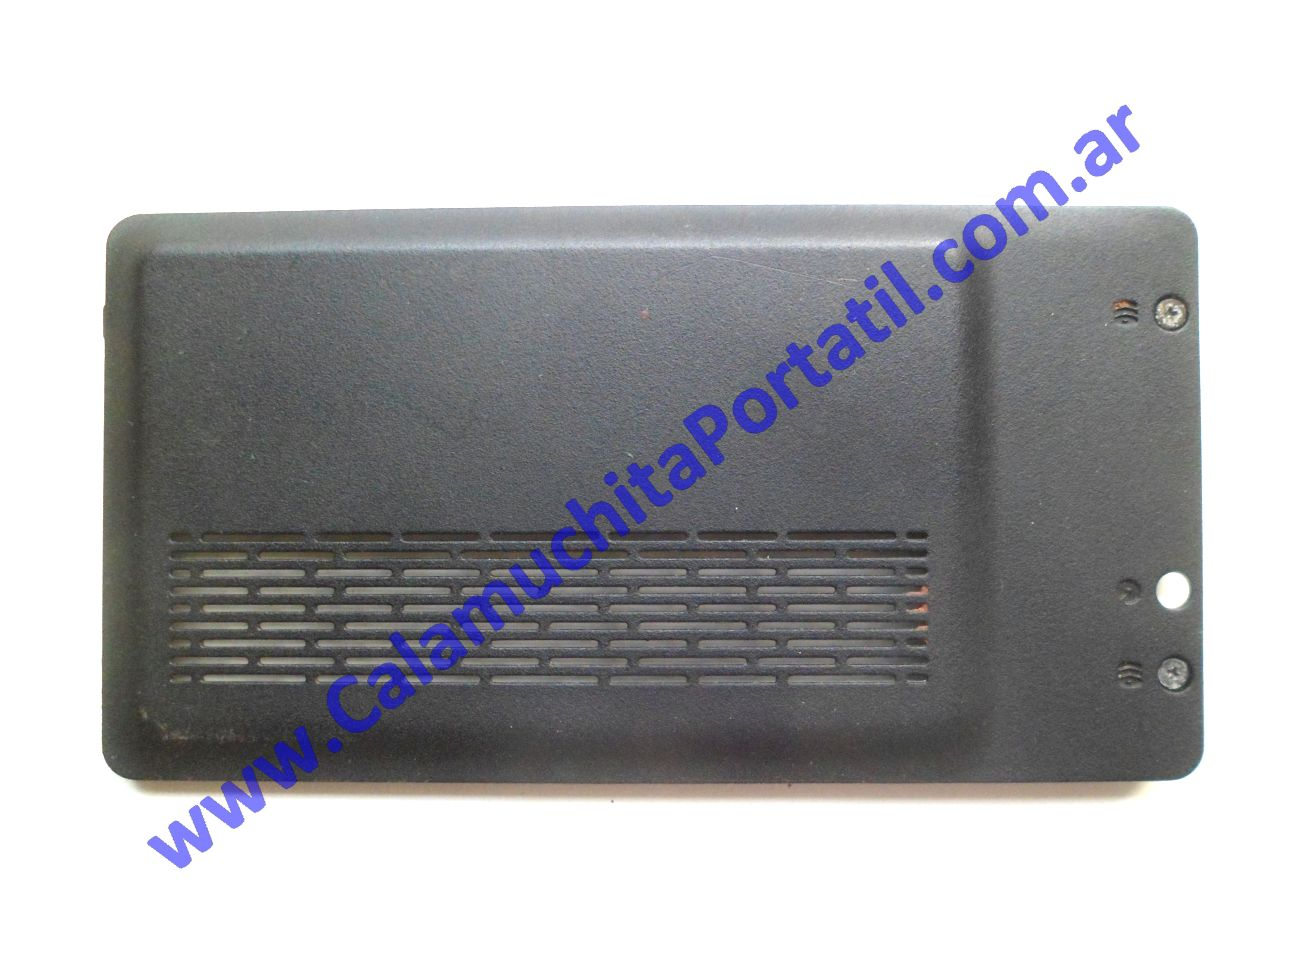 0553CTD Carcasas Tapa Disco Hewlett Packard Pavillion dv2000 / dv2422la / GM690LA#AC8